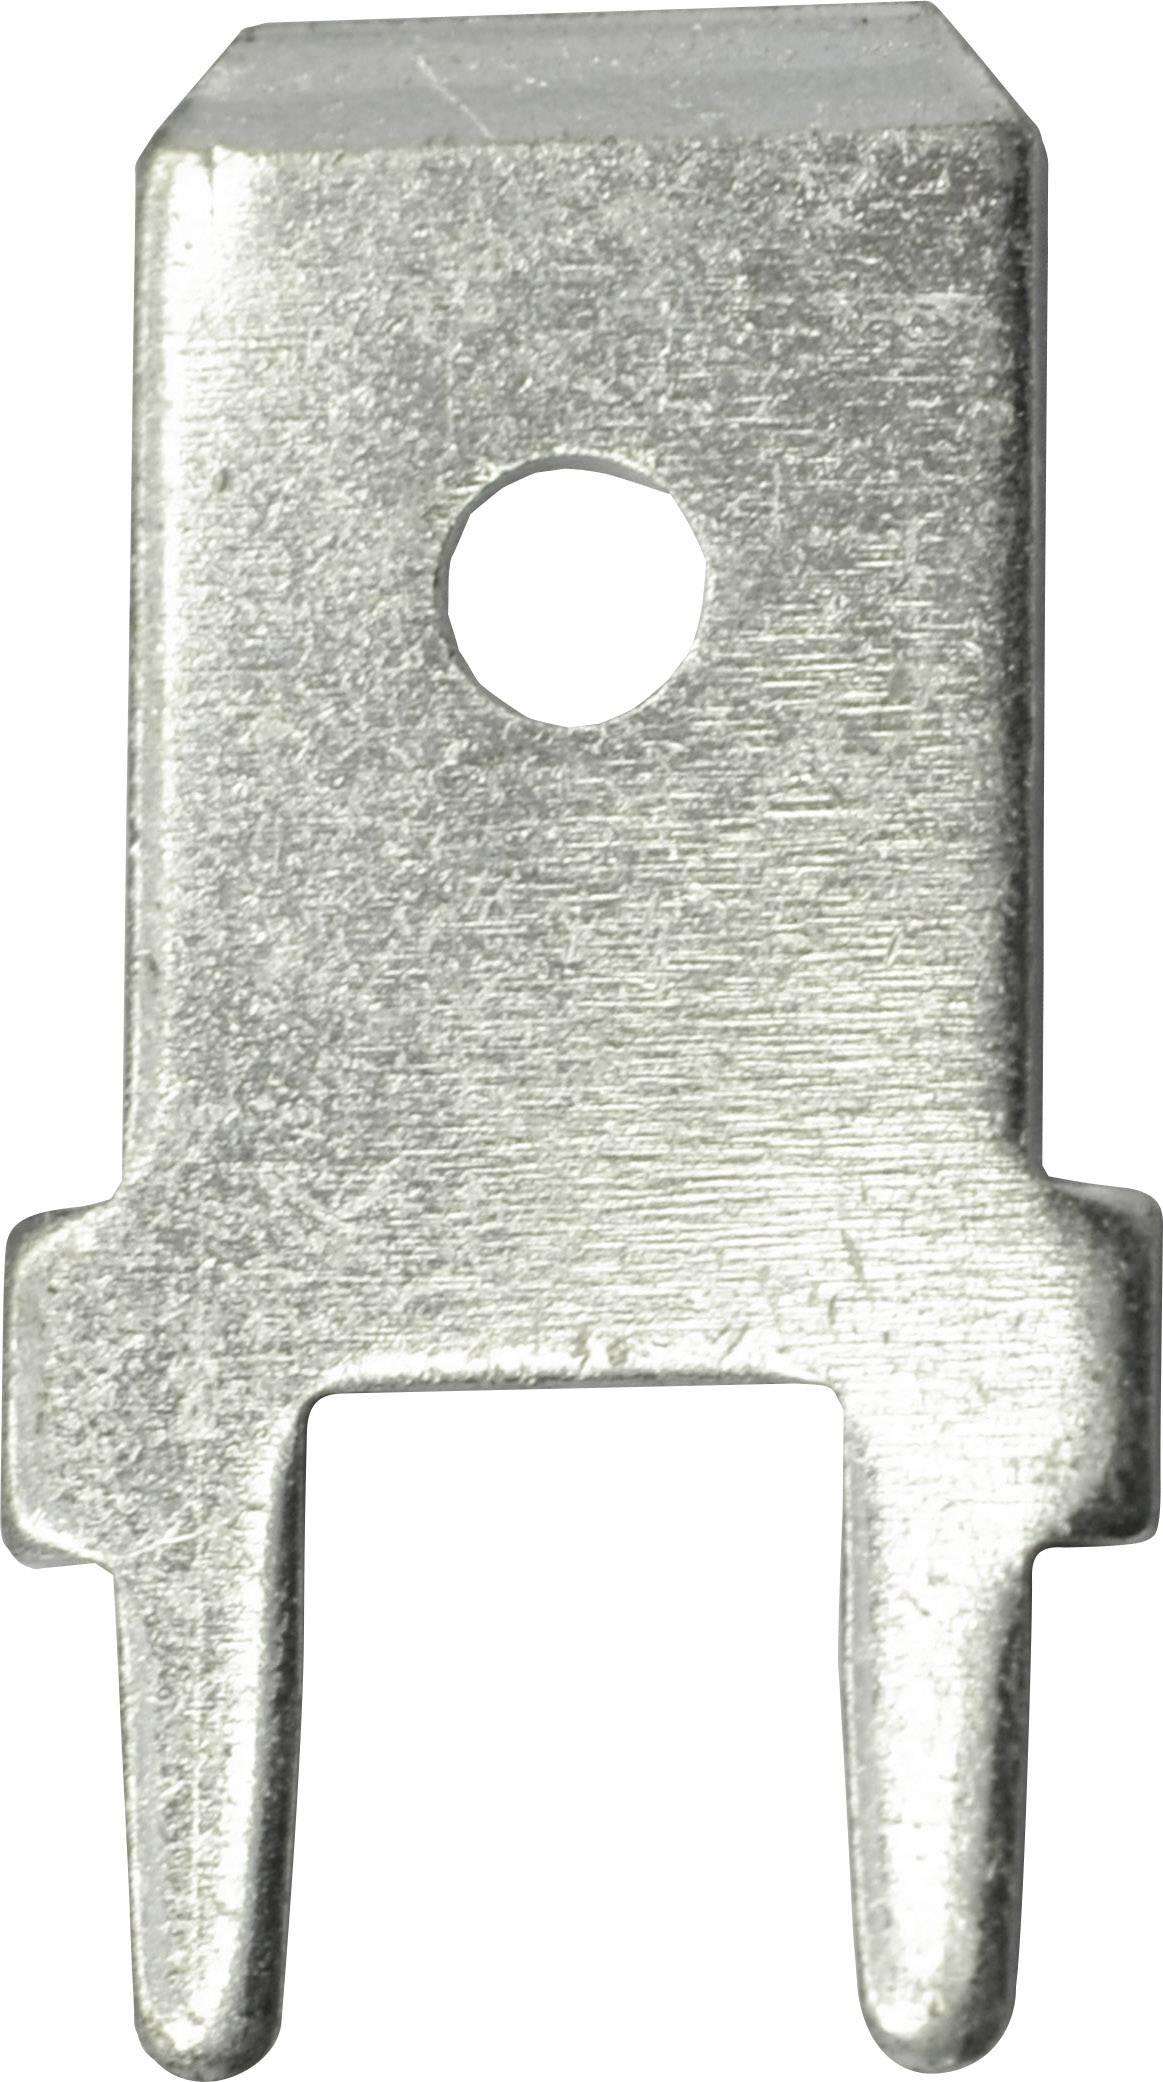 Faston zástrčka Vogt Verbindungstechnik 3866a.61 6.3 mm x 0.8 mm, 180 °, bez izolace, kov, 100 ks